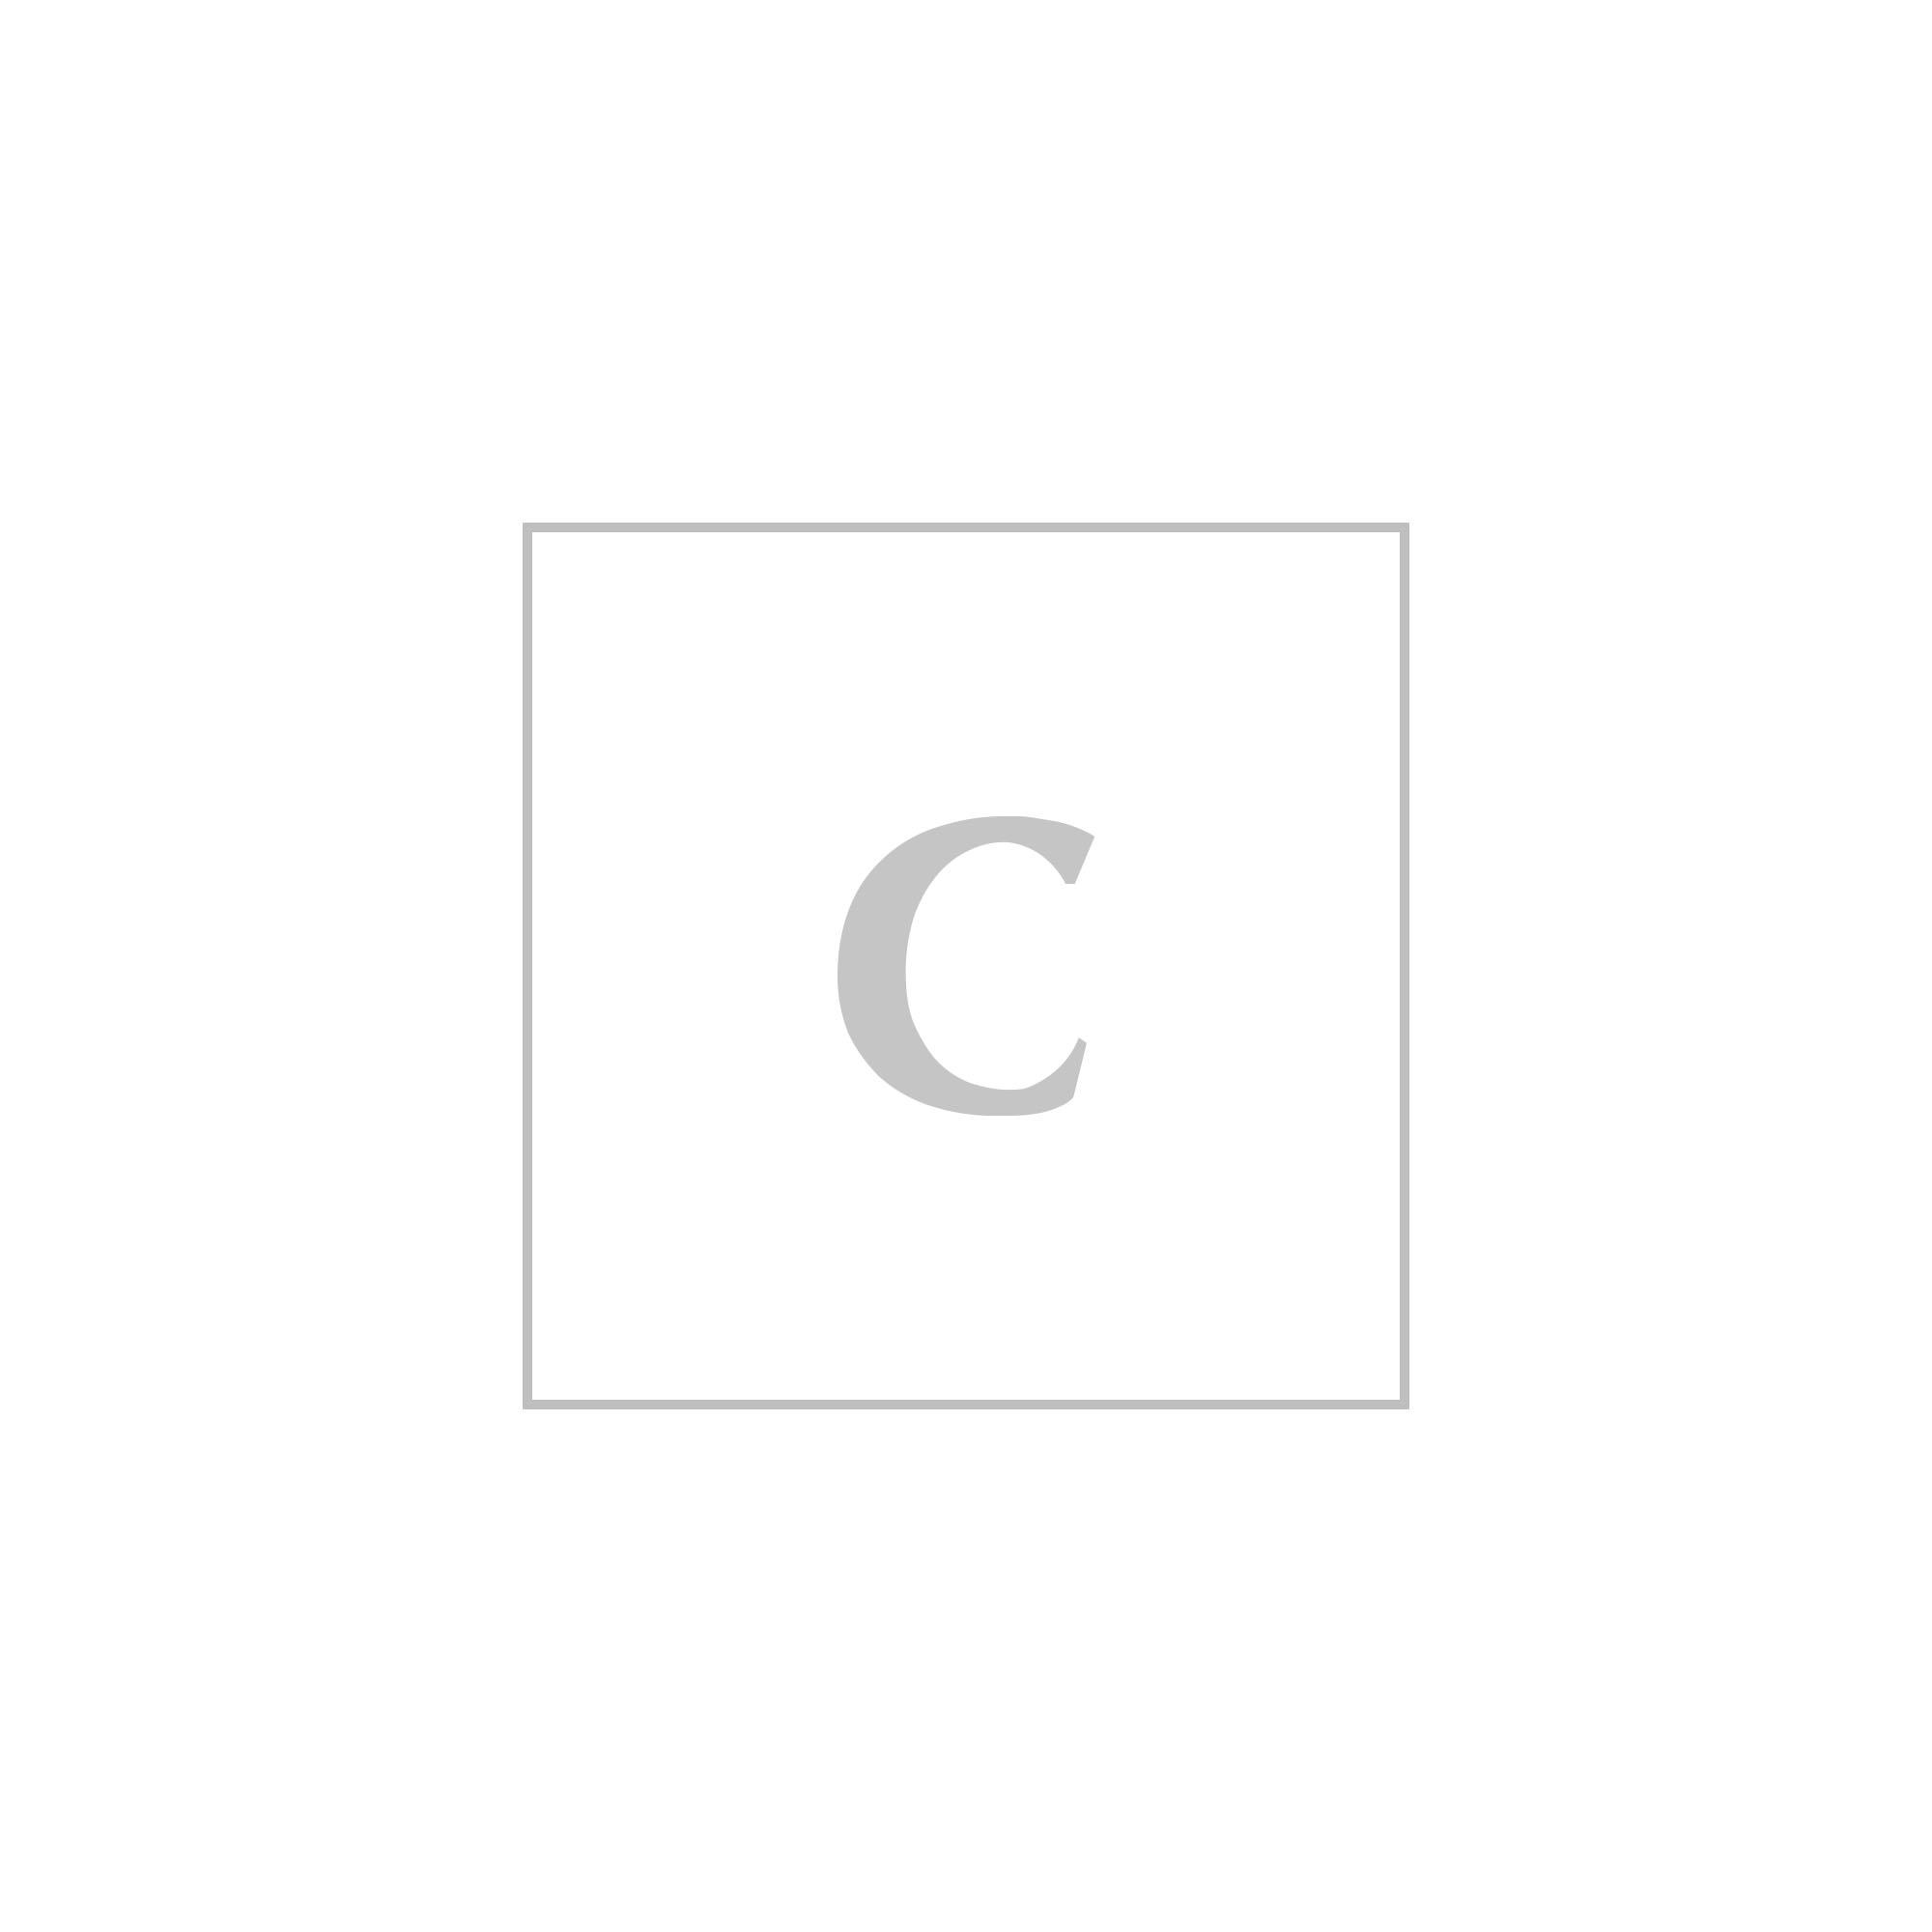 Cc collection corneliani single-breasted blazer